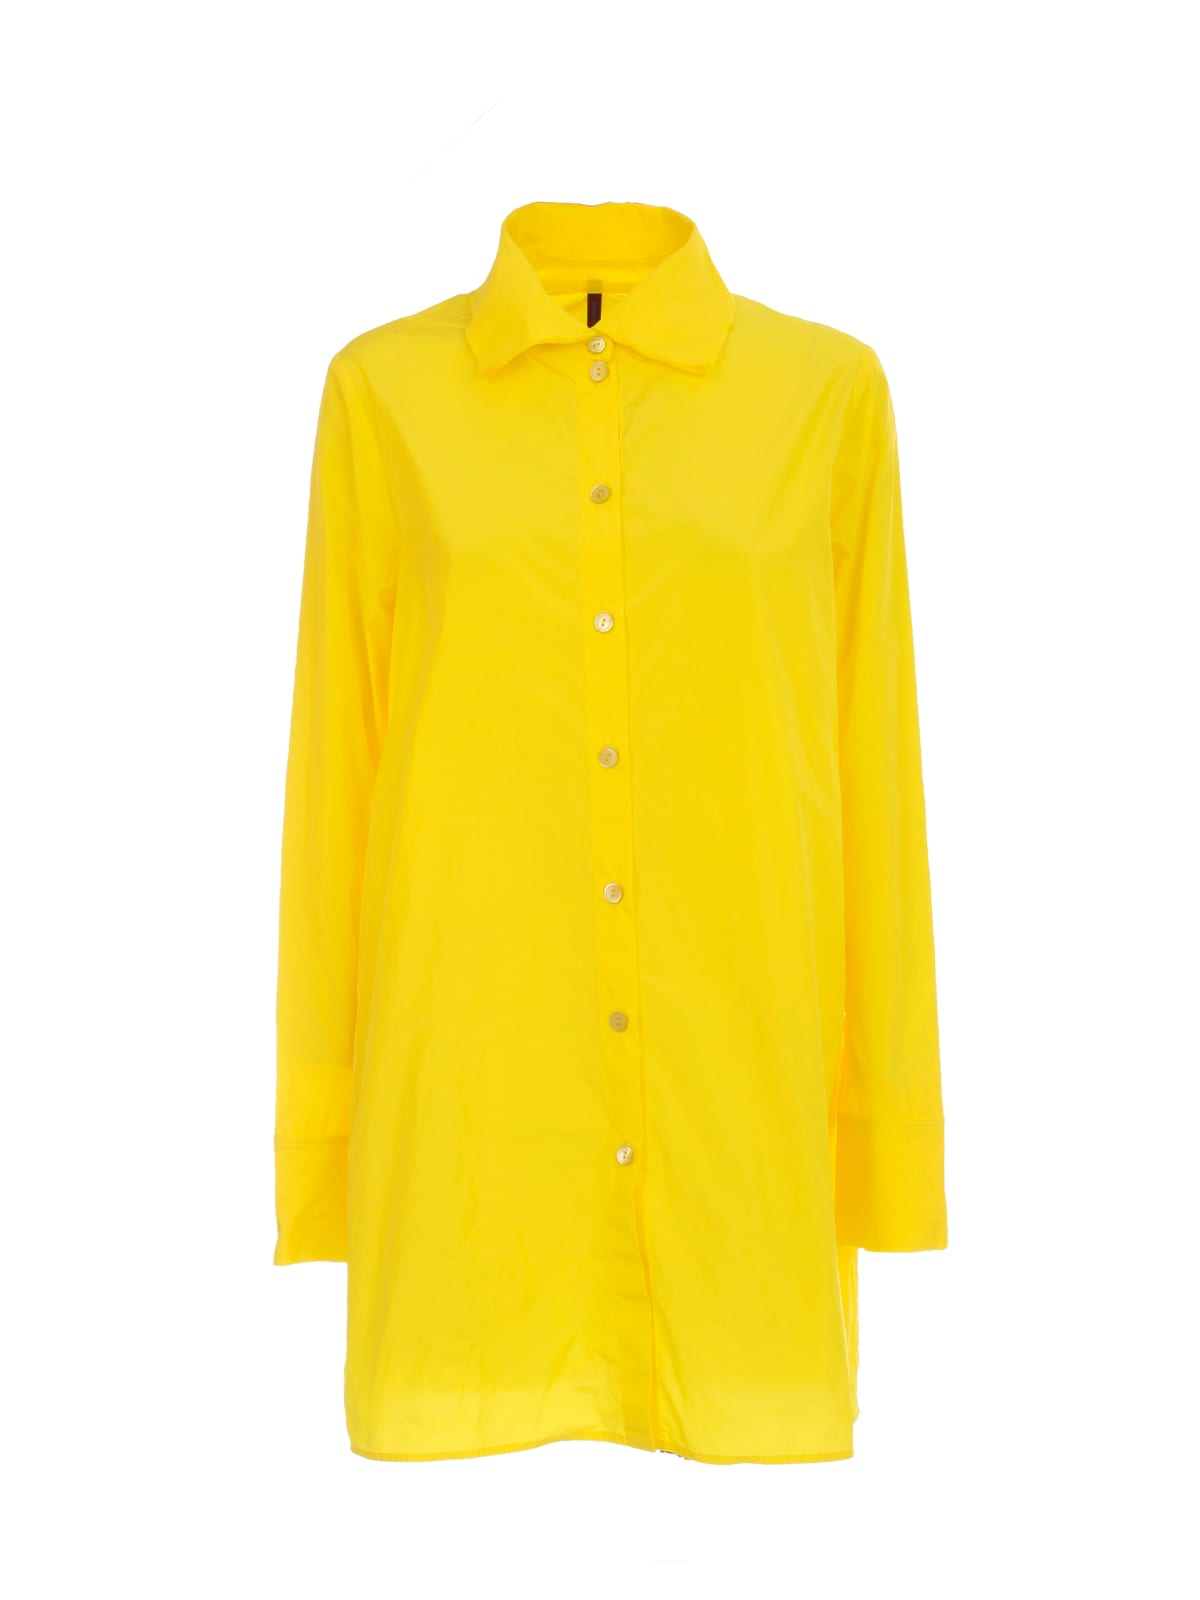 Deko Blouse Long Shirt